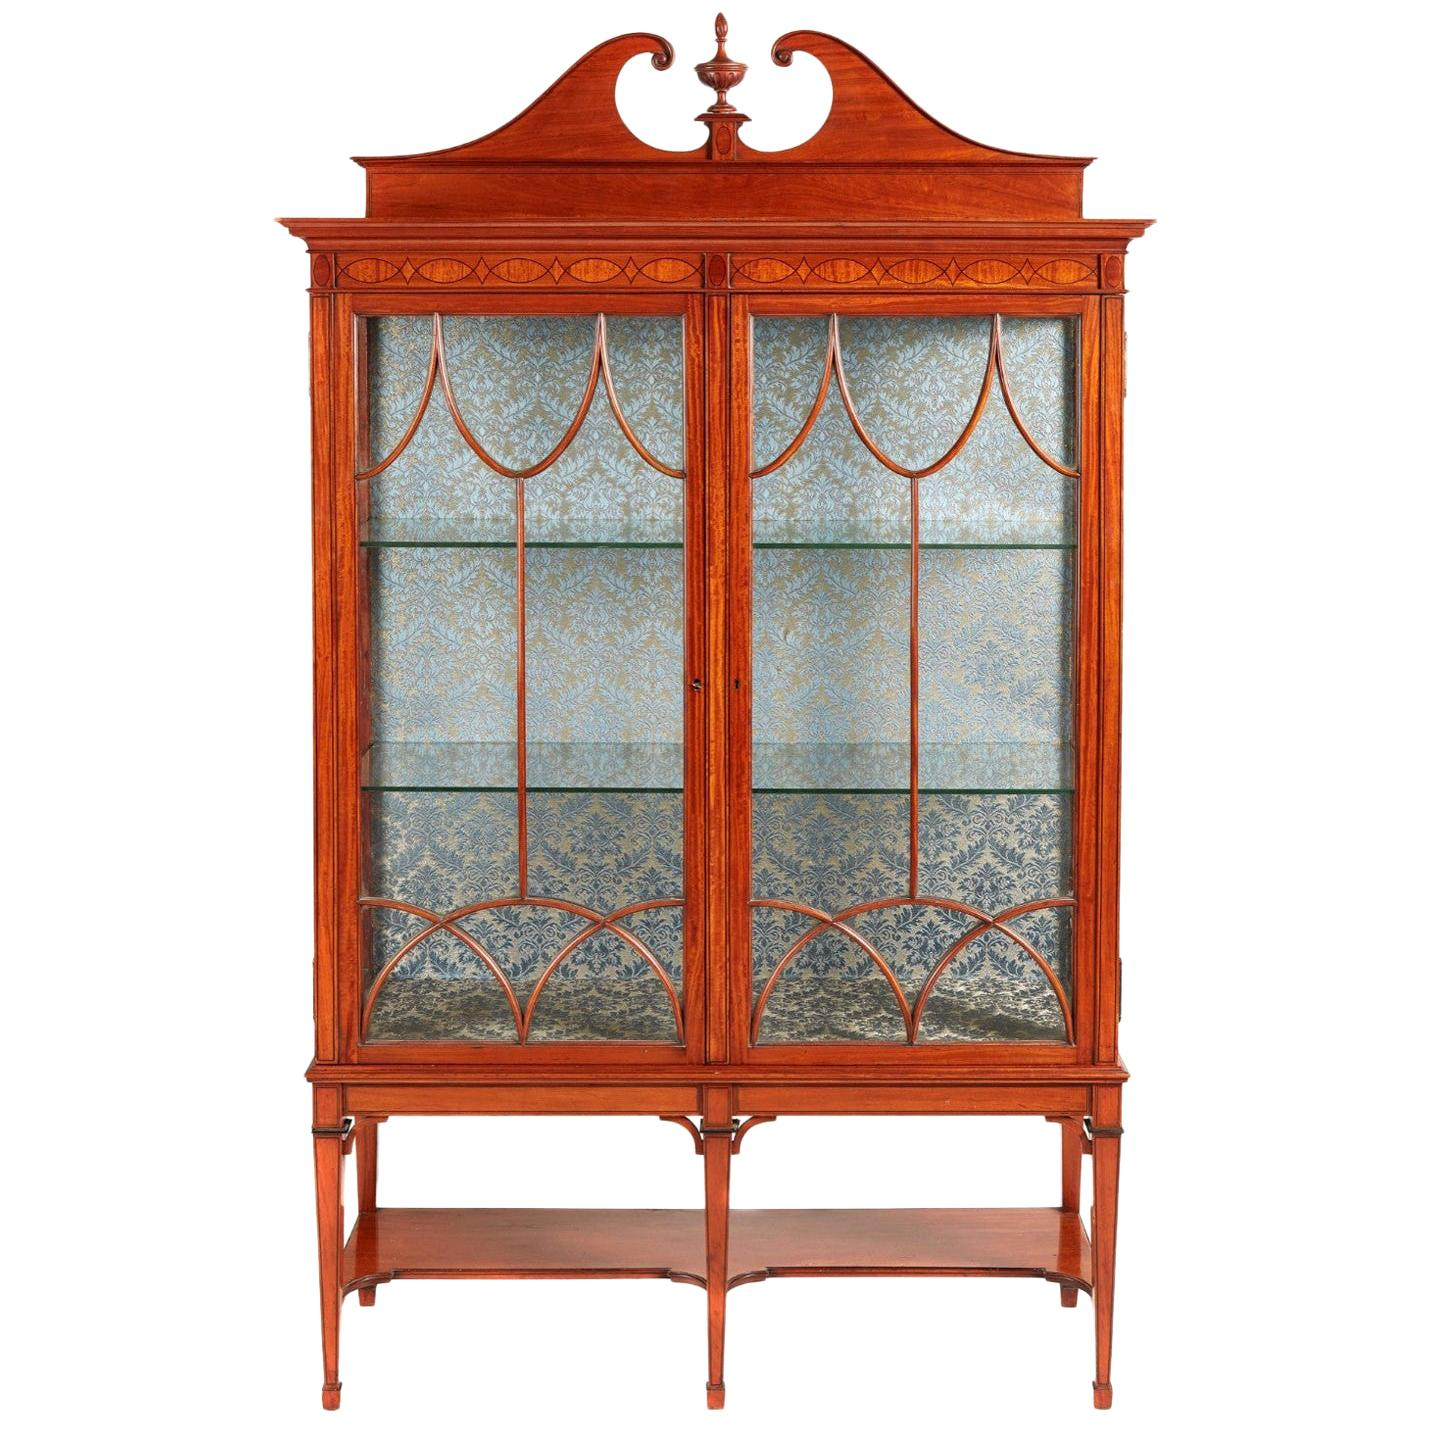 Antique 19th Century Victorian Inlaid Satinwood Display Cabinet